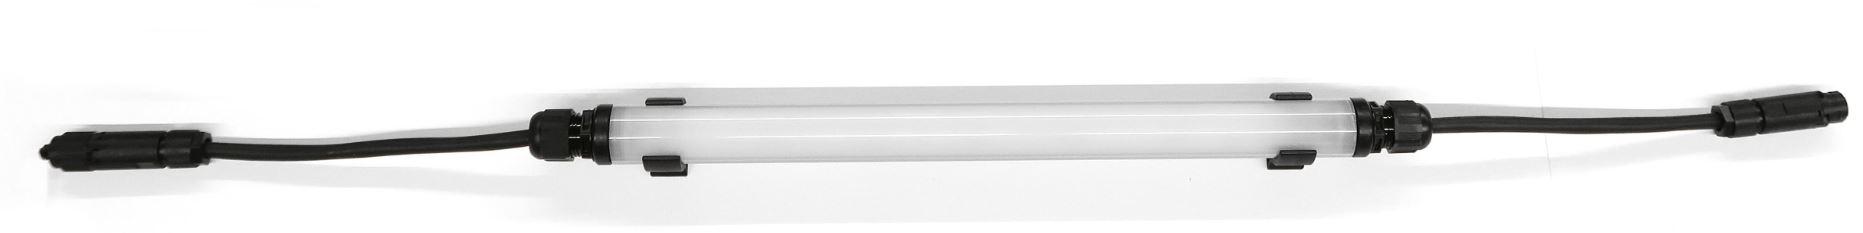 Serie 23 LED: 6 Watt/ 24-42 Volt AC/DC/ 447 mm (DU m. Kab u. SteckV)